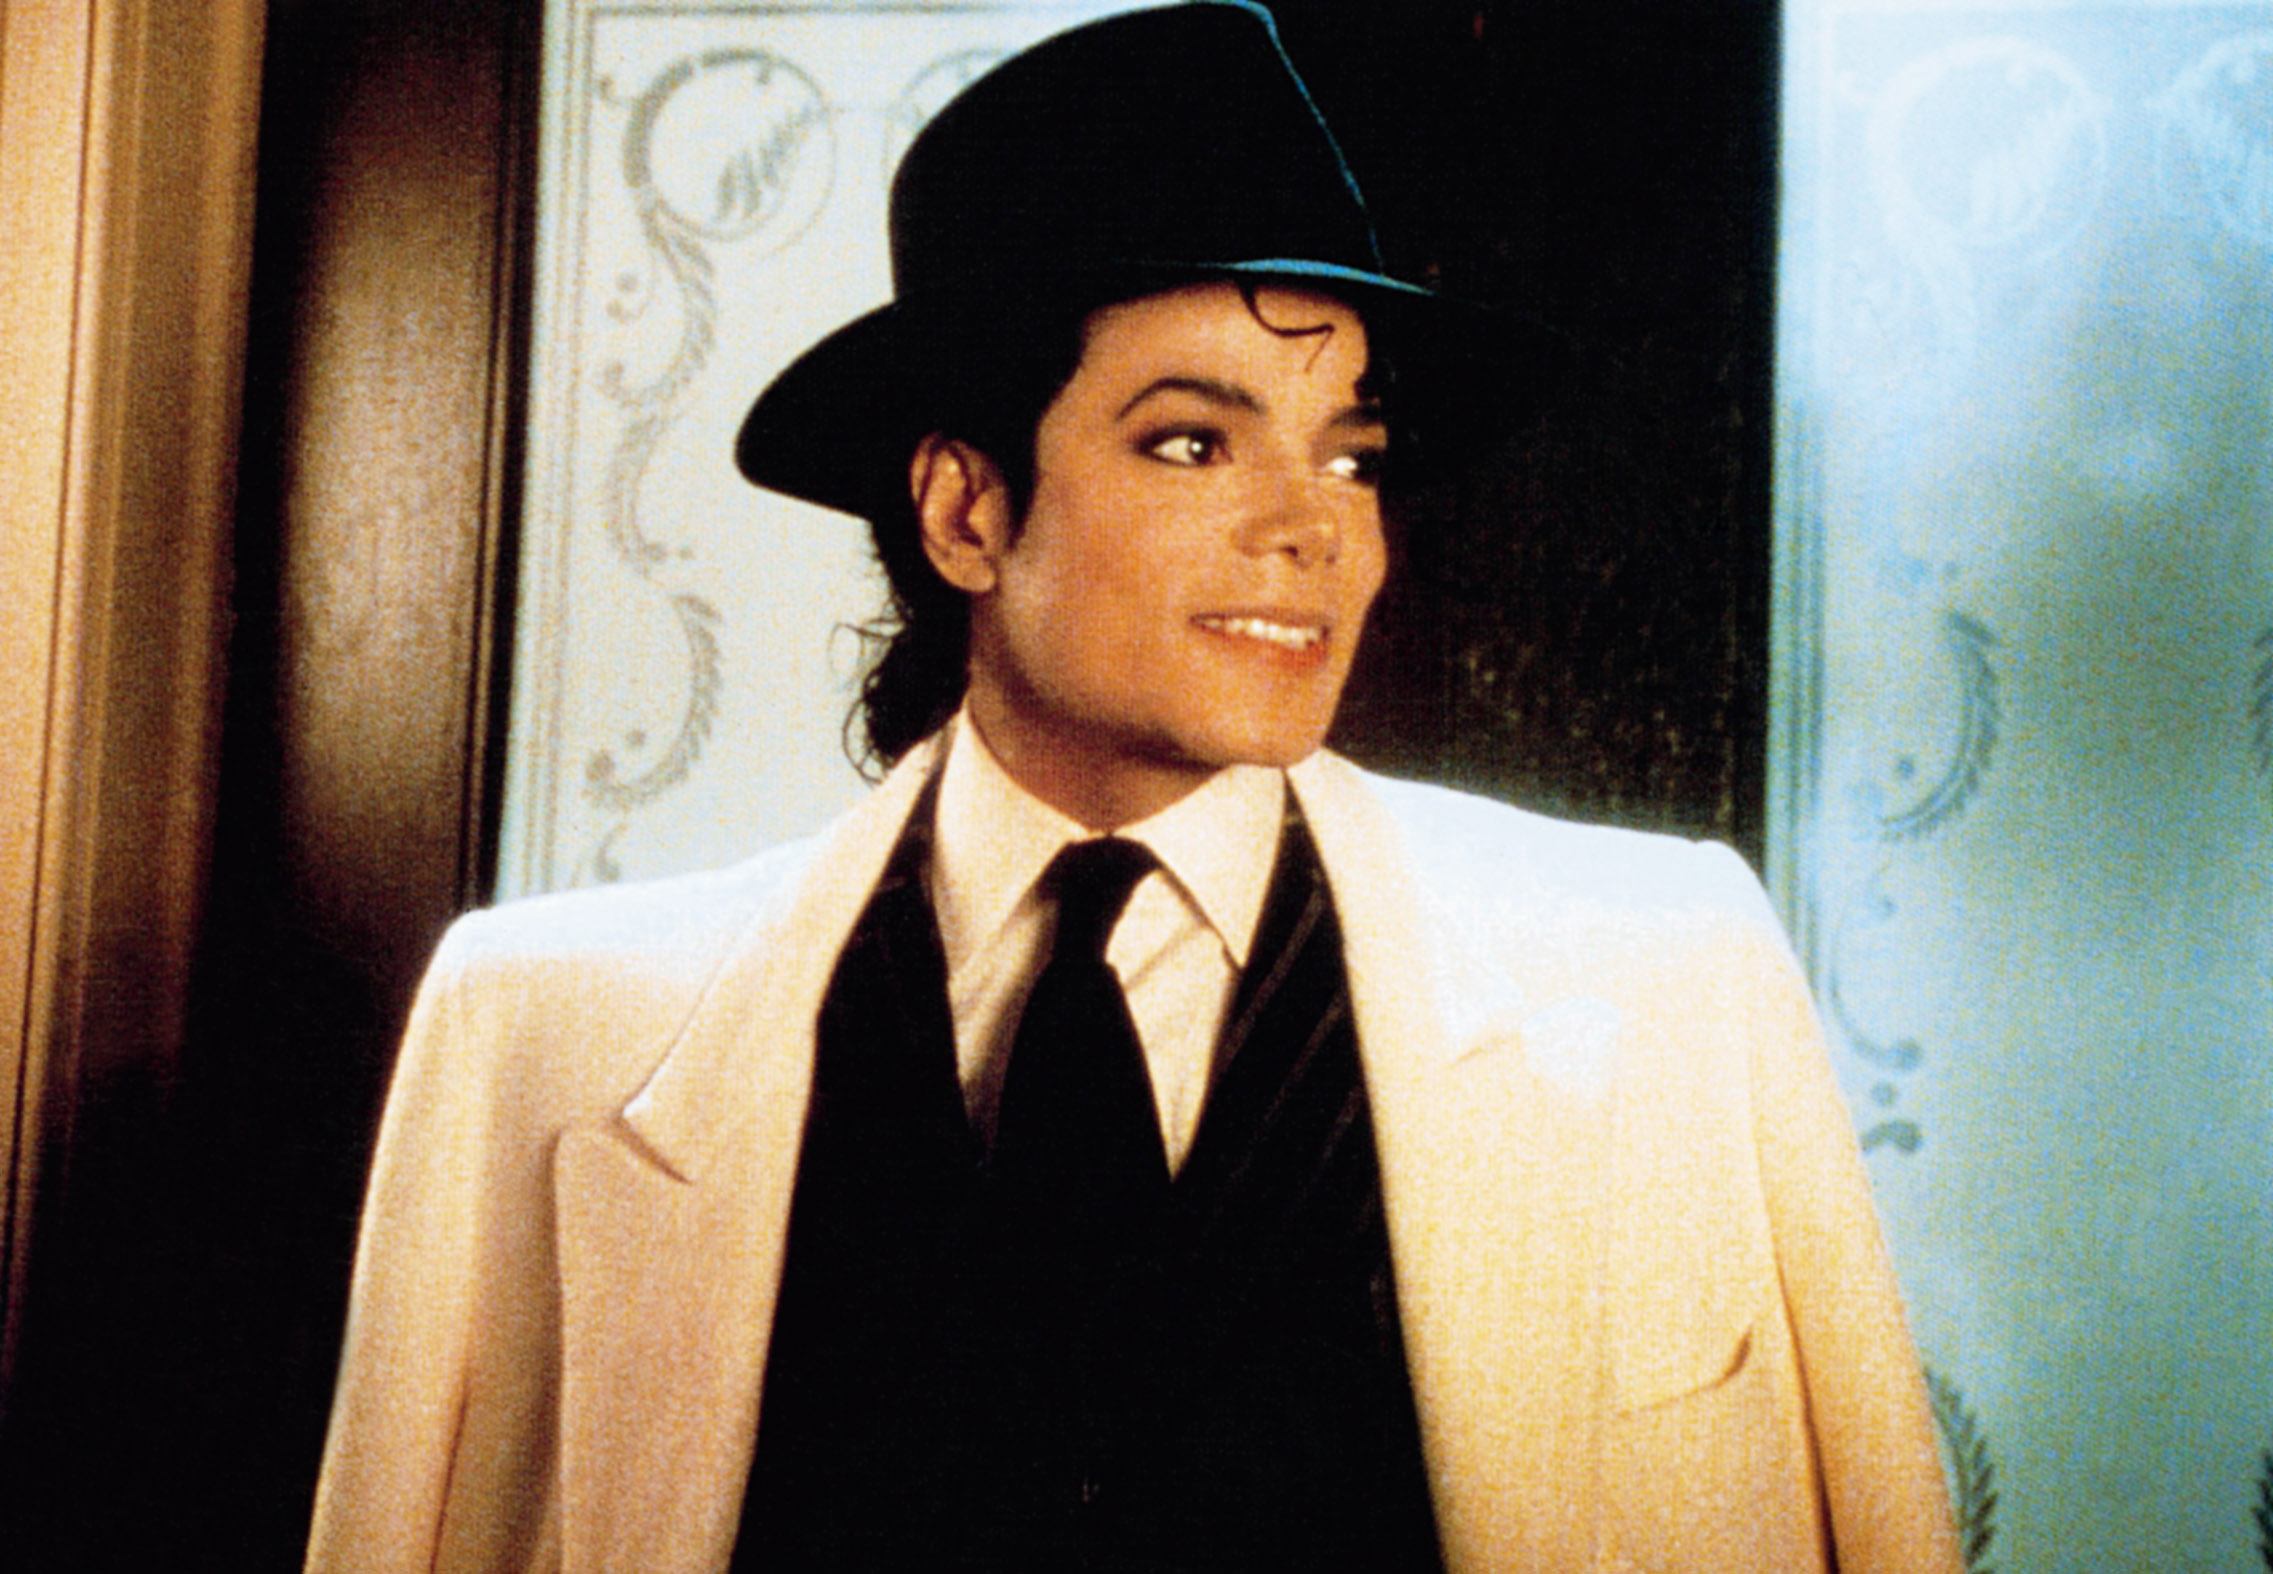 Lawsuit By Michael Jackson Accuser Dismissed By Judge